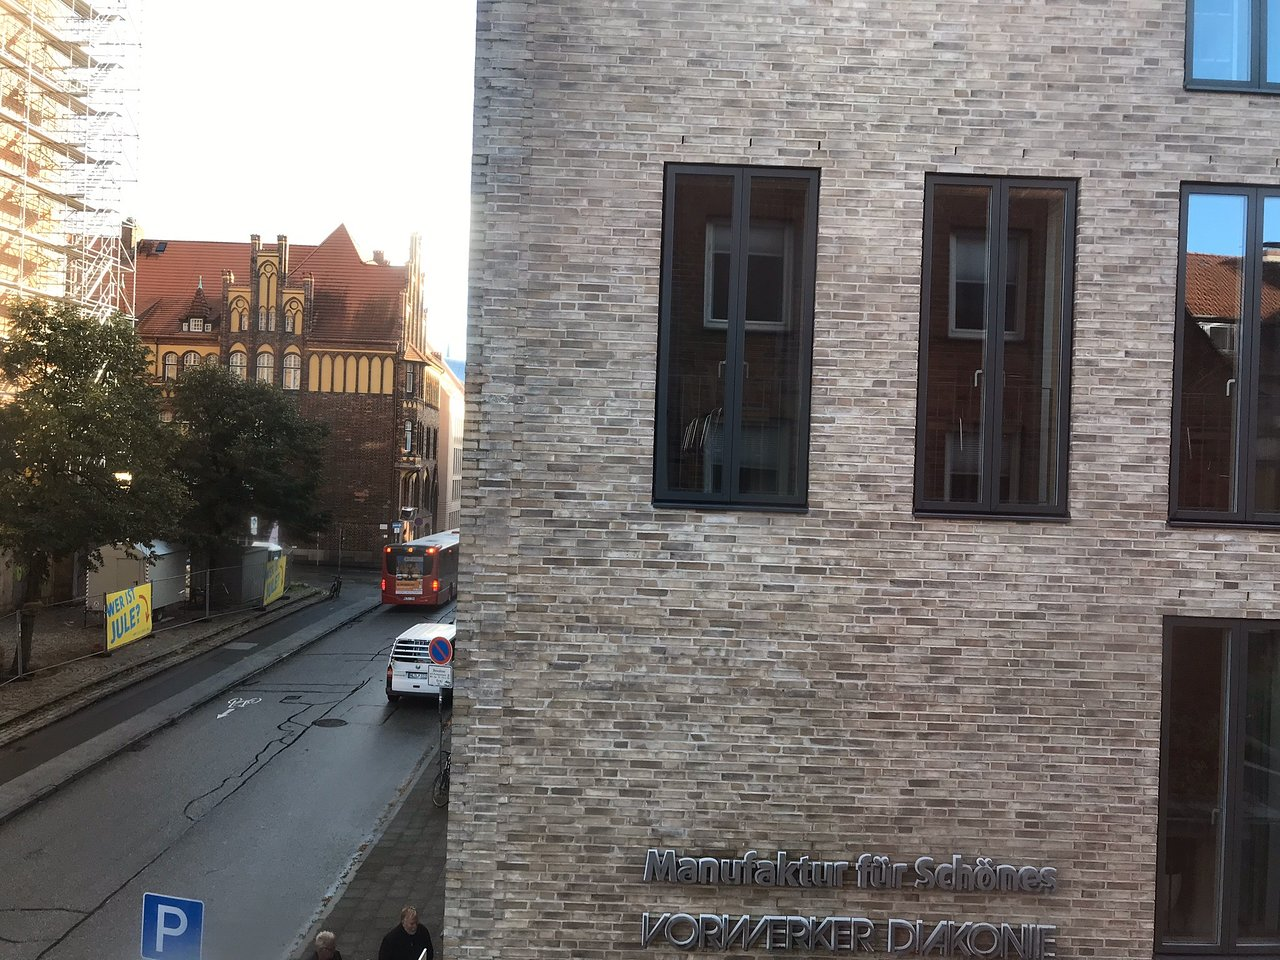 Hotel An Der Marienkirche 105 1 1 6 Prices Reviews